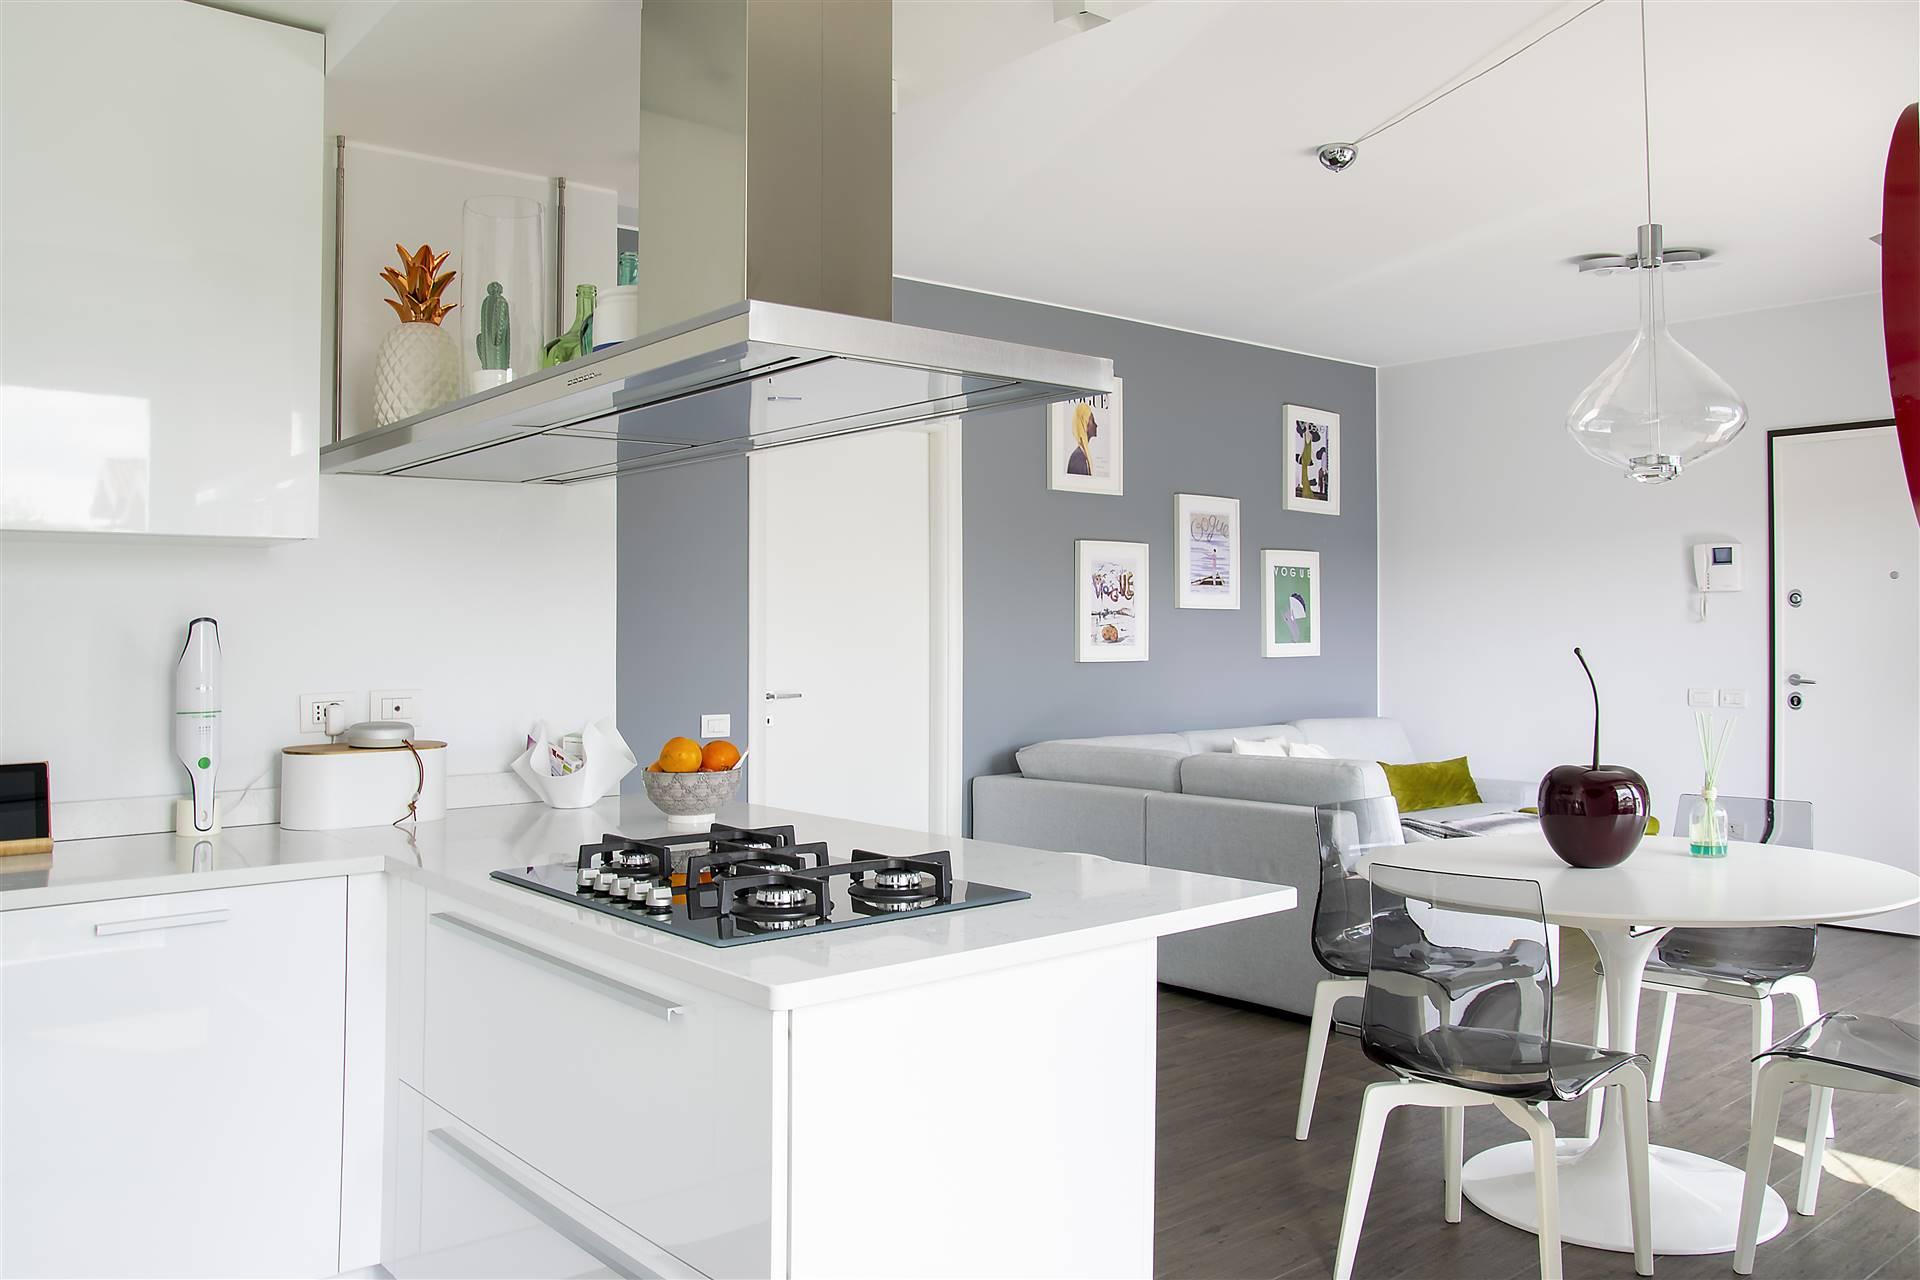 sogg/cucina